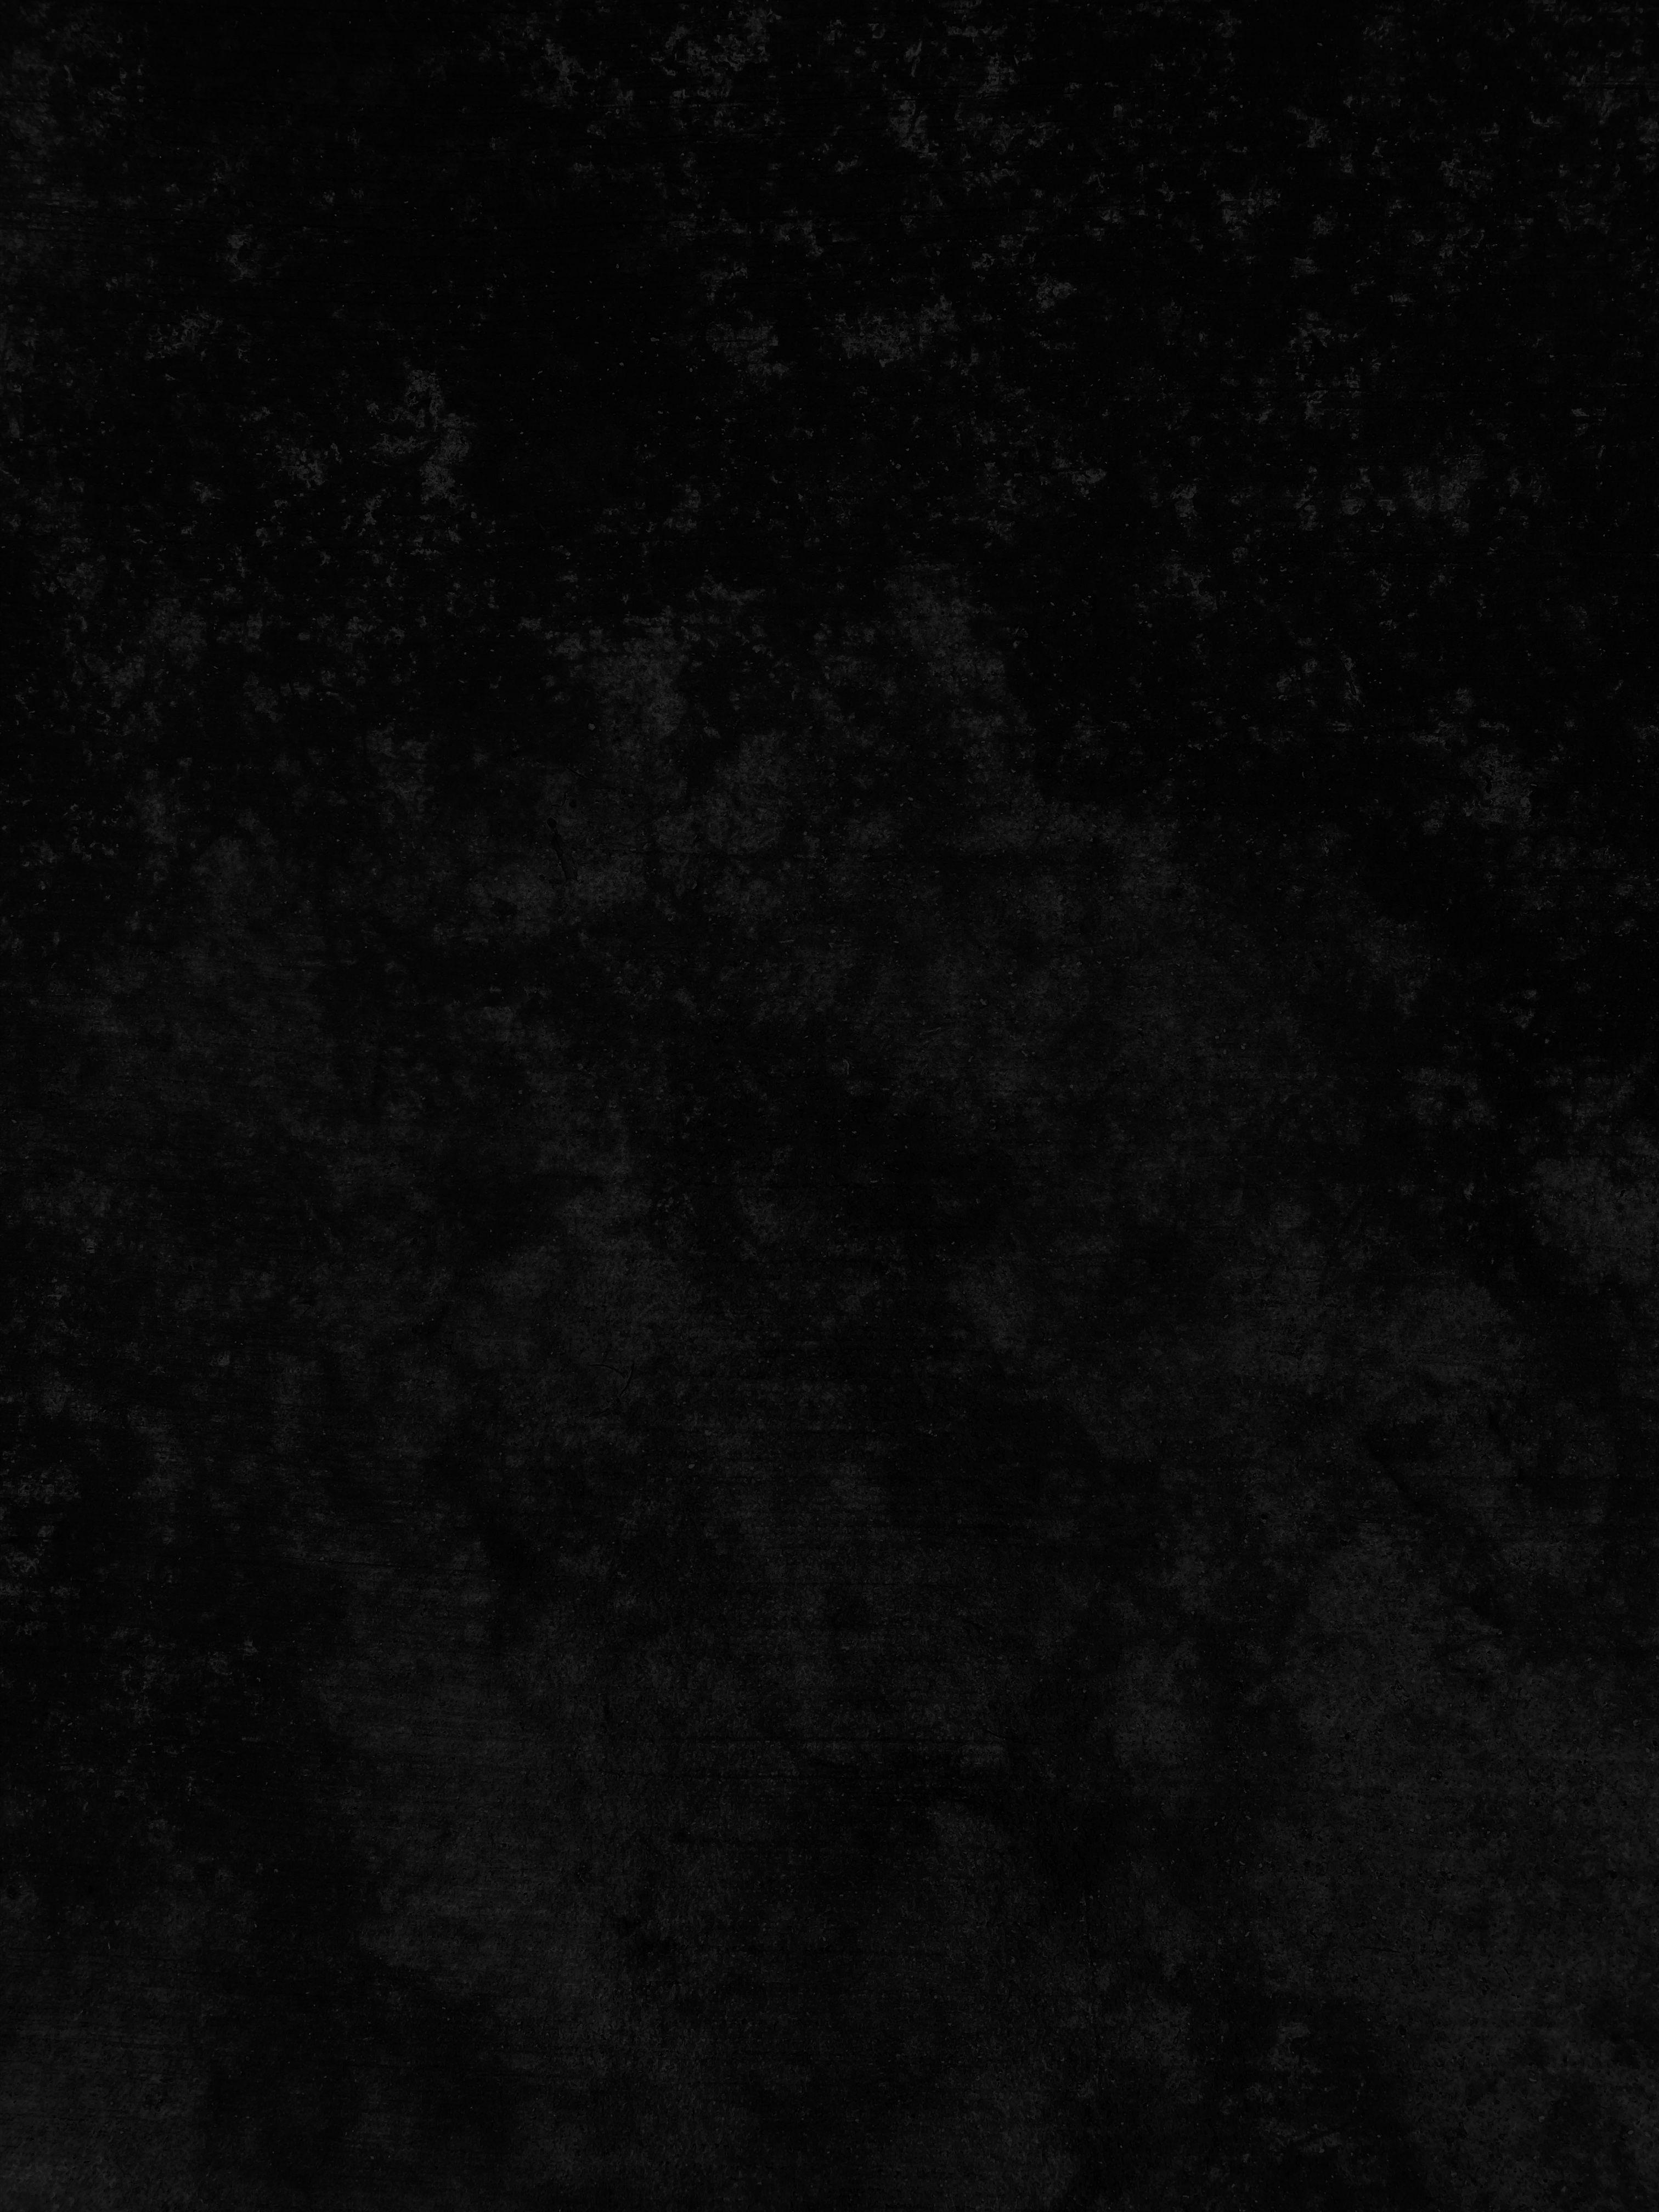 Black Texture Phone Wallpapers - Wallpaper Cave